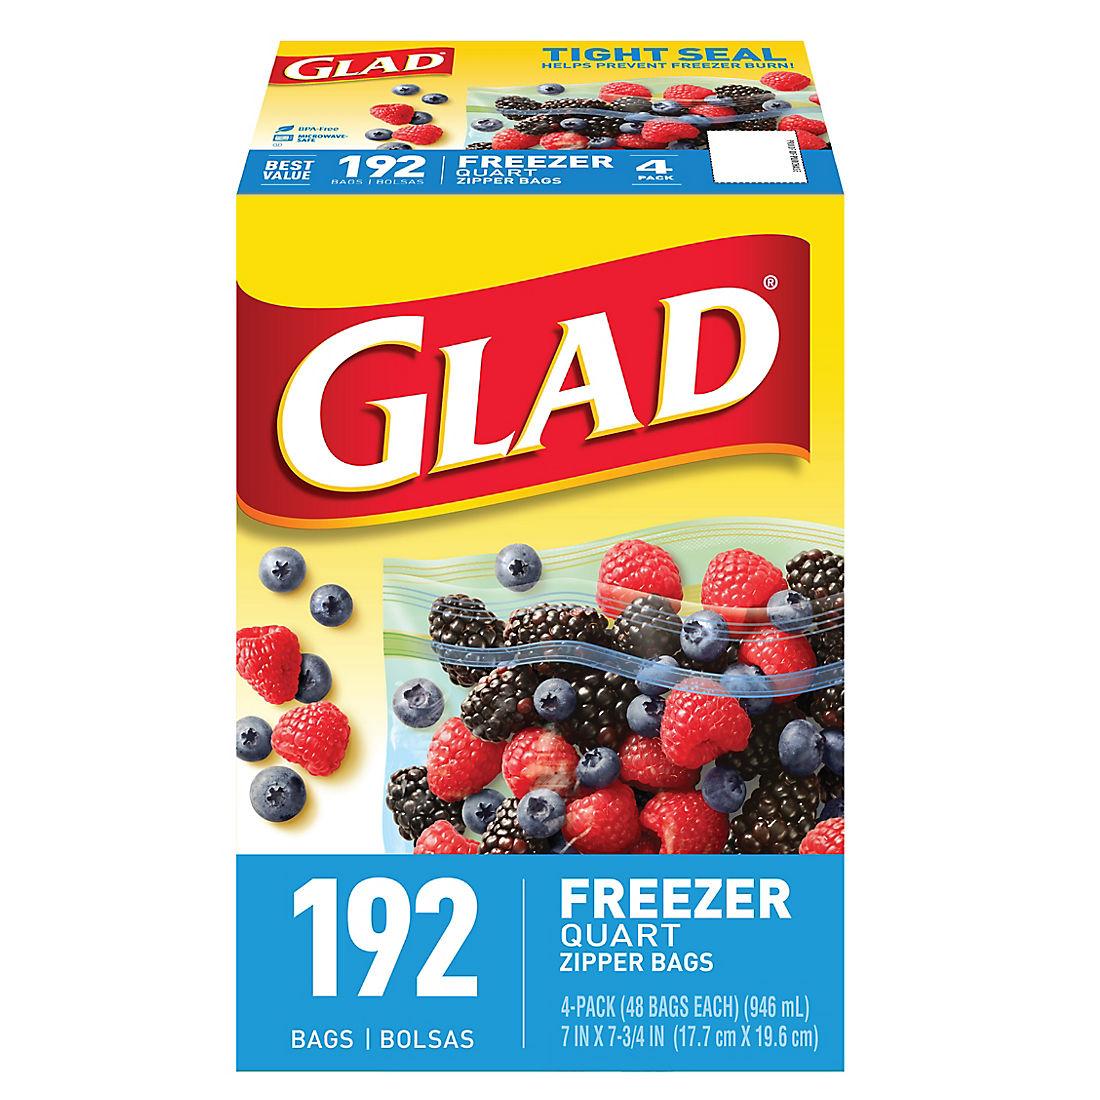 Glad 1-Qt  Plastic Zipper Freezer Bags, 4 pk /48 ct  - Clear Blue